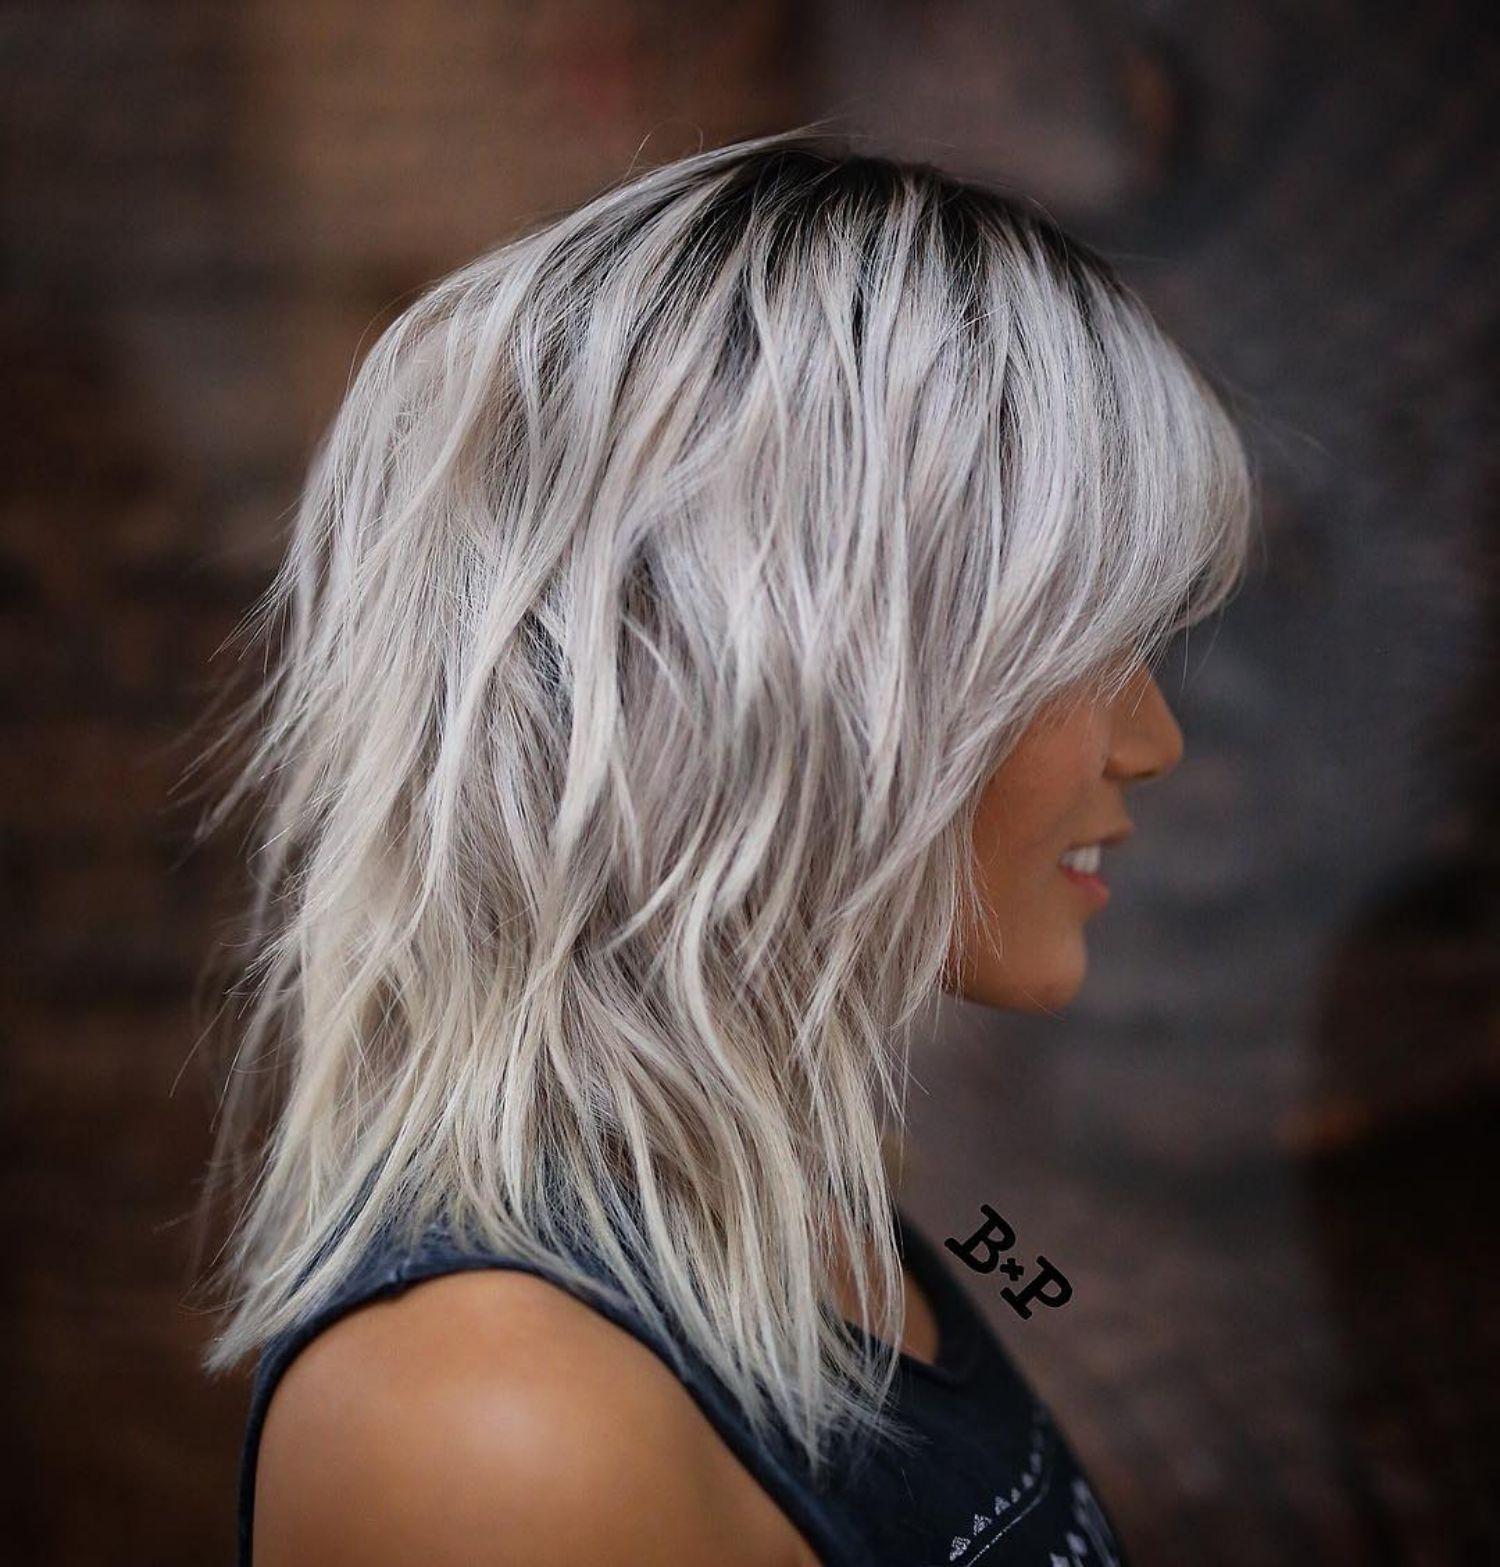 Medium layered hairstyle with bangs womenshaircuts womens